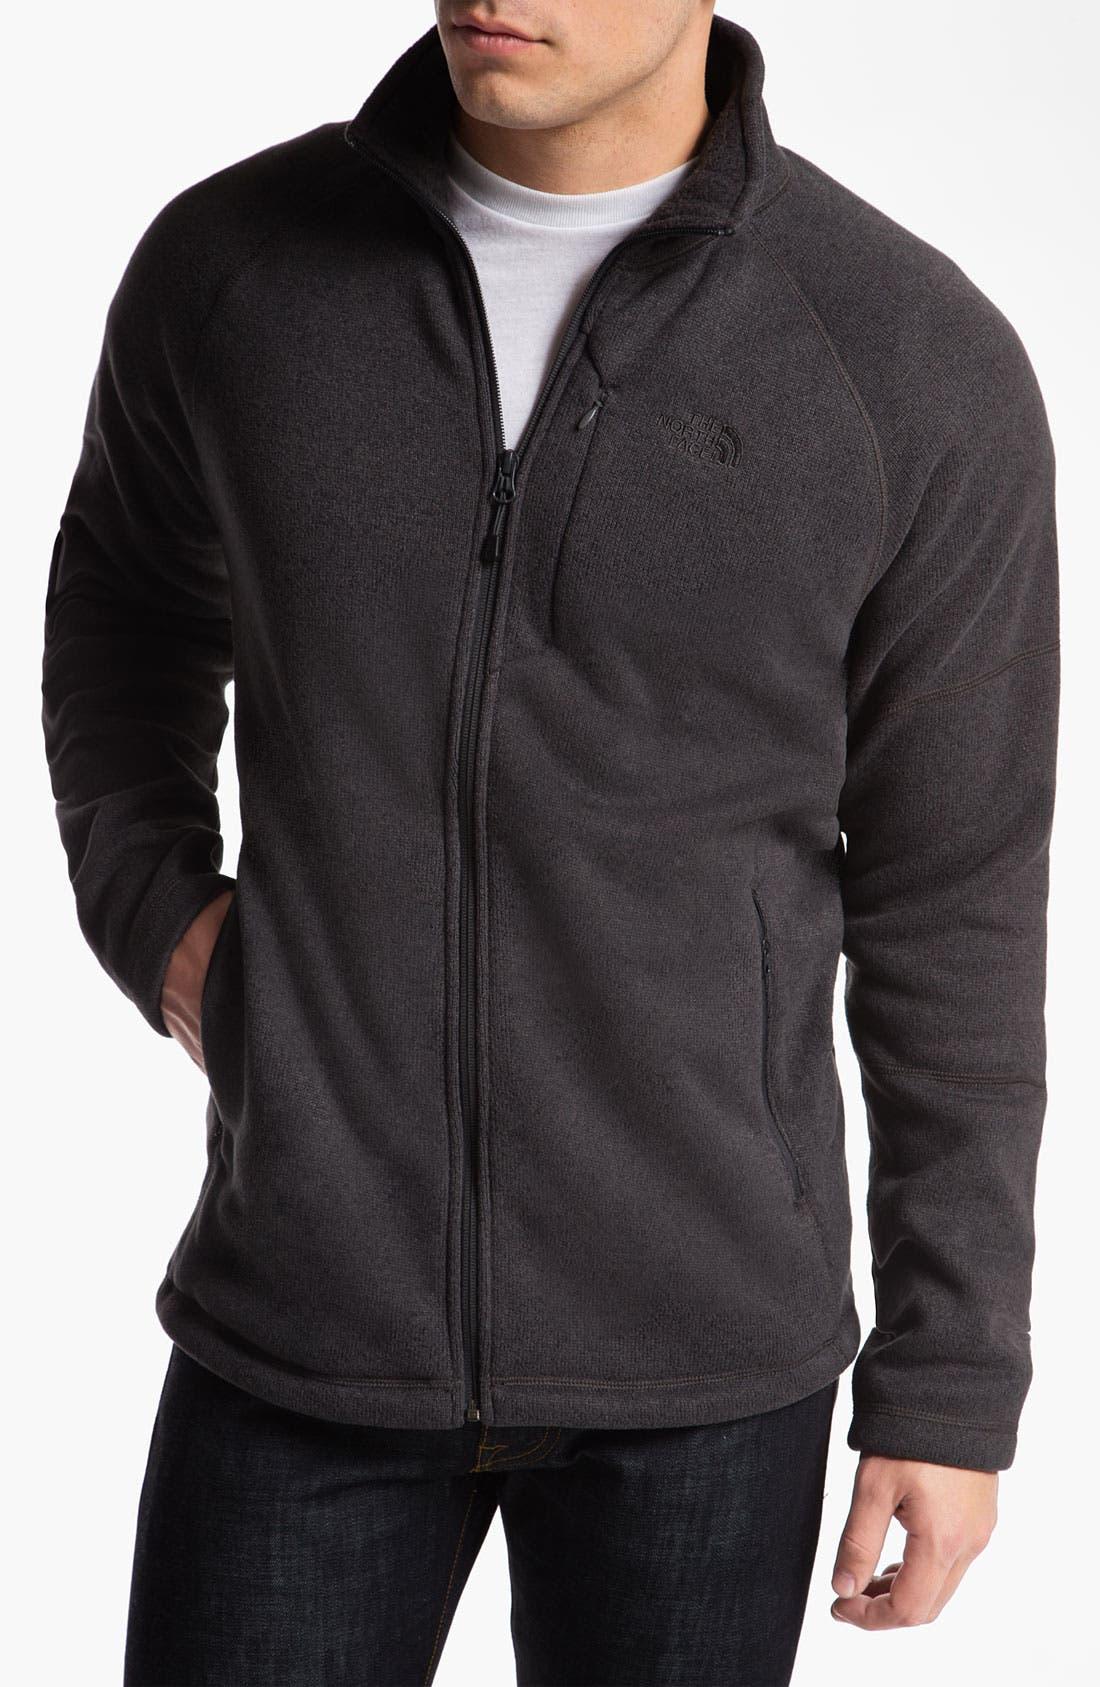 Main Image - The North Face 'Gordon Lyons'  Fleece Jacket